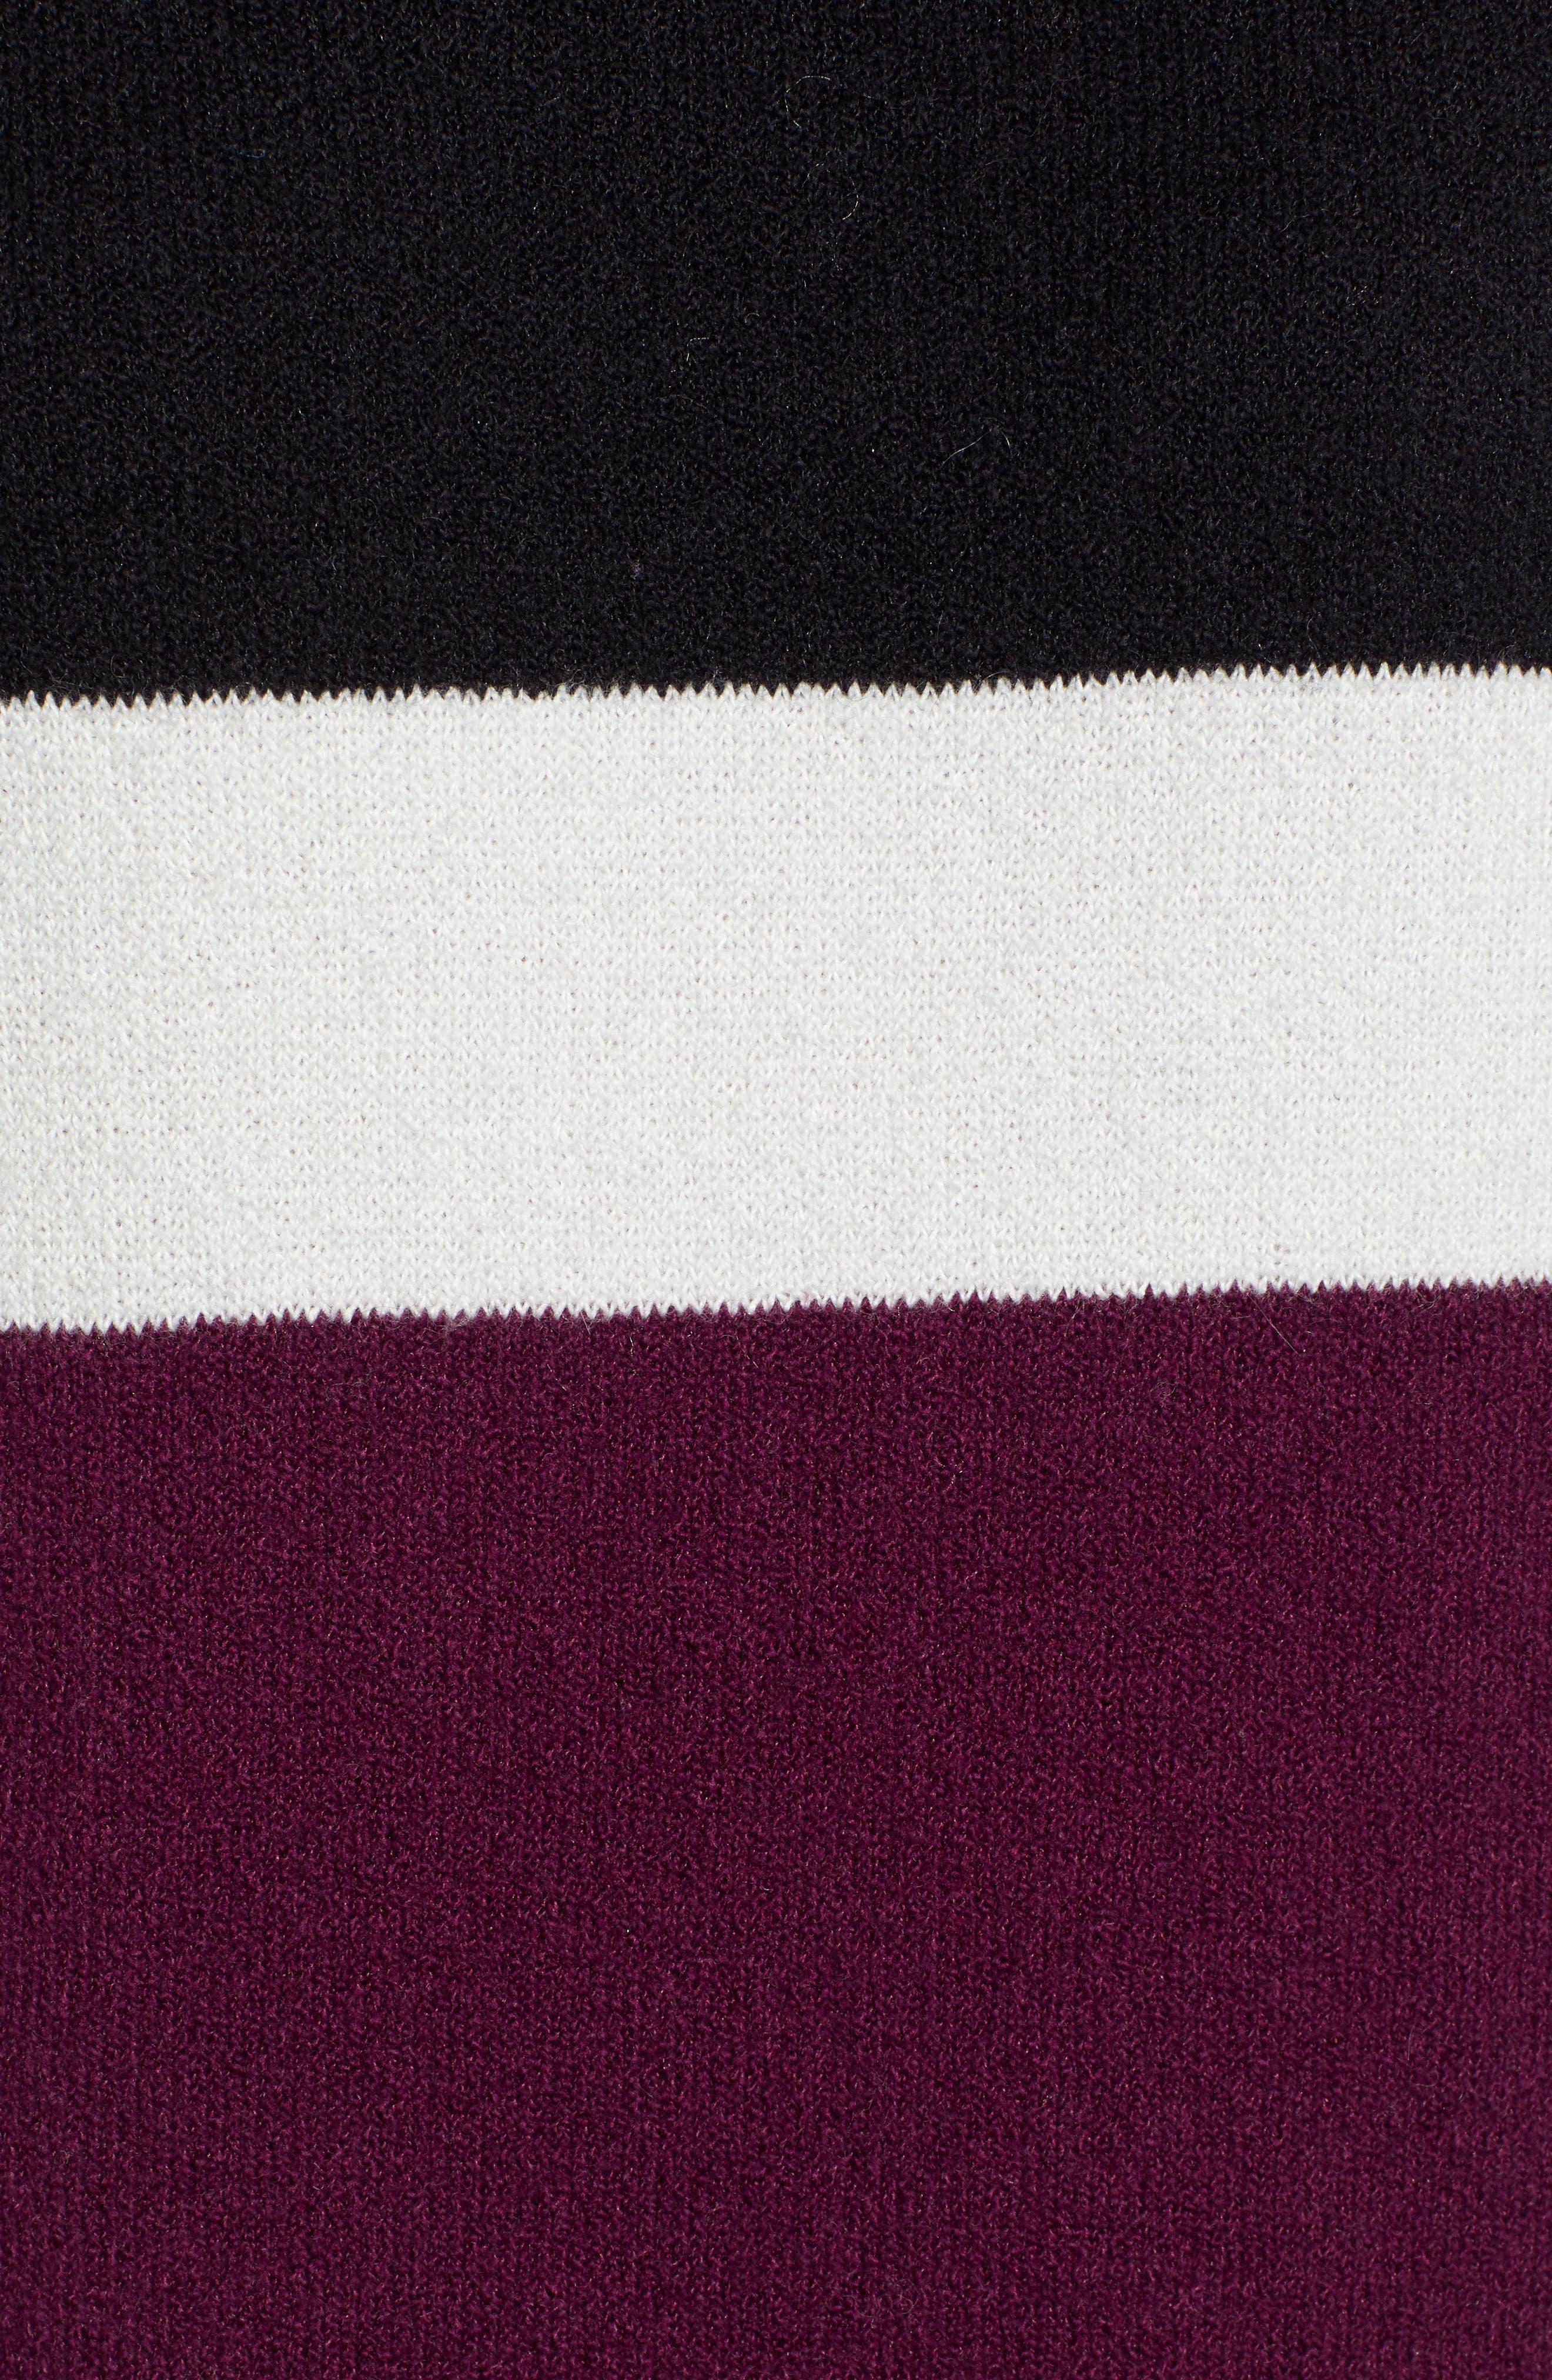 Stripe Sweater Dress,                             Alternate thumbnail 6, color,                             510